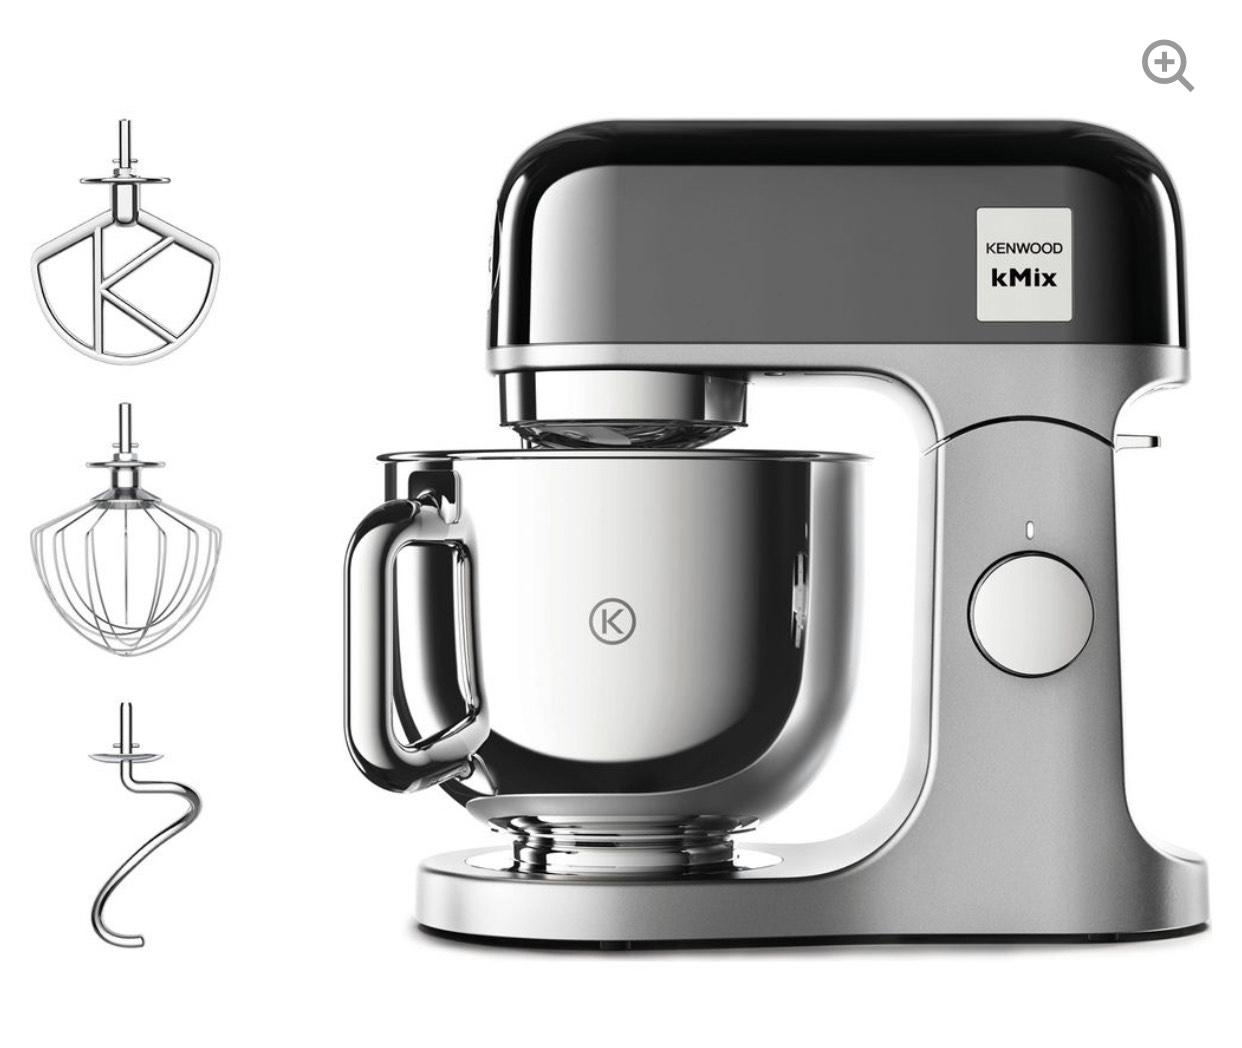 KENWOOD kMix KMX760BC Kitchen Machine - Black & Stainless Steel £299 @ Currys PC World